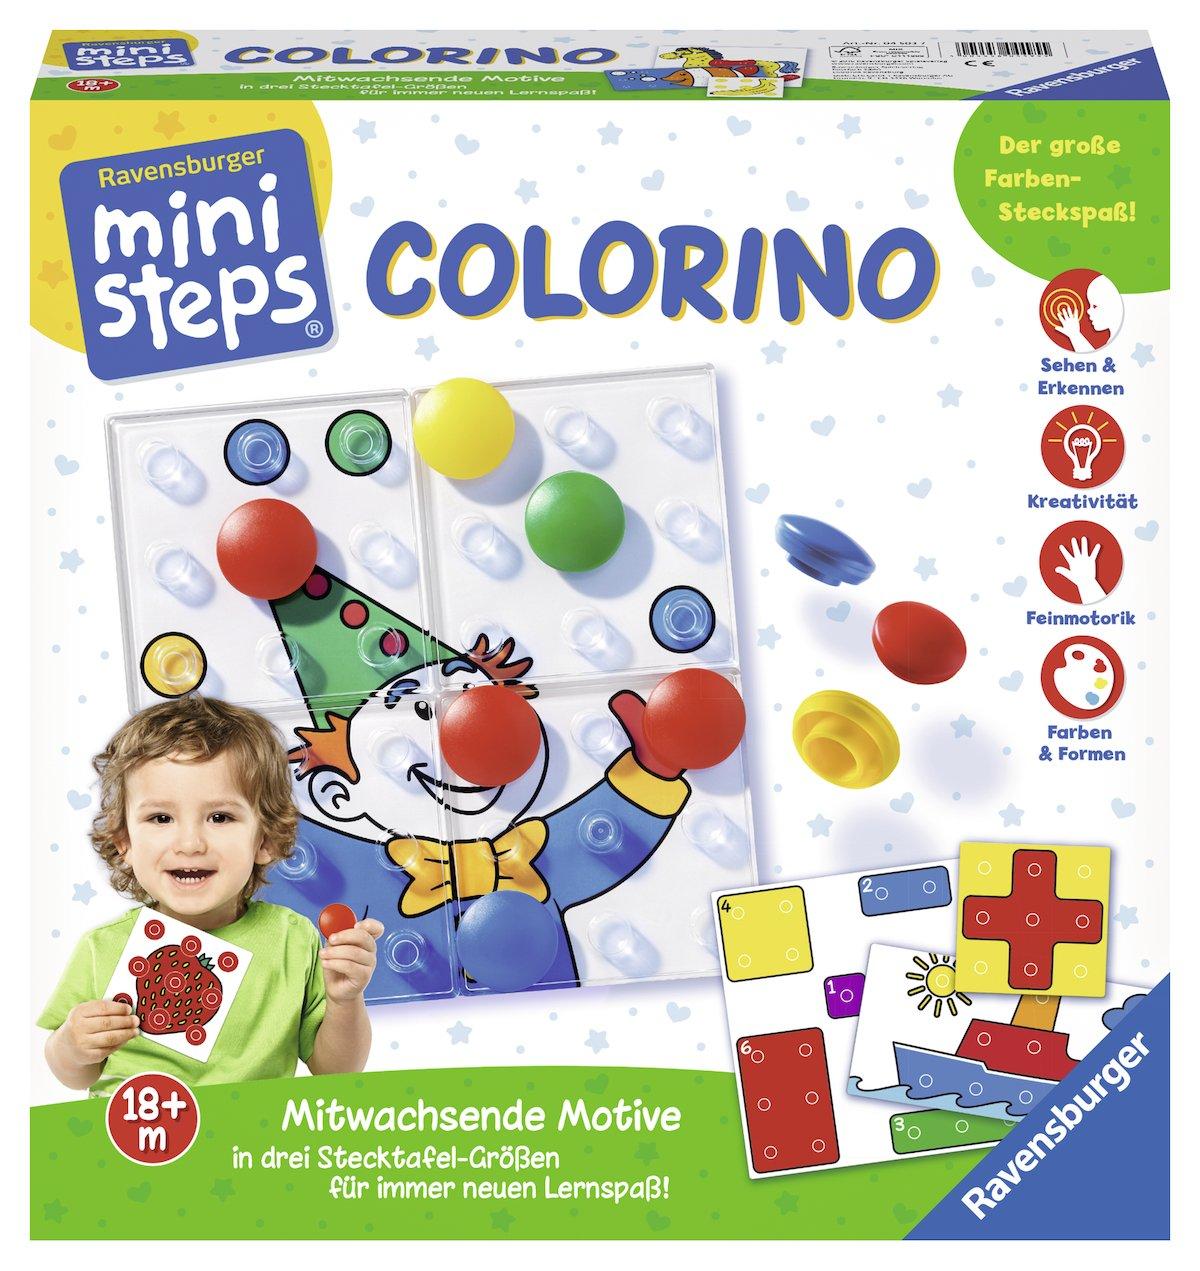 Ravensburger-04503-Colorino